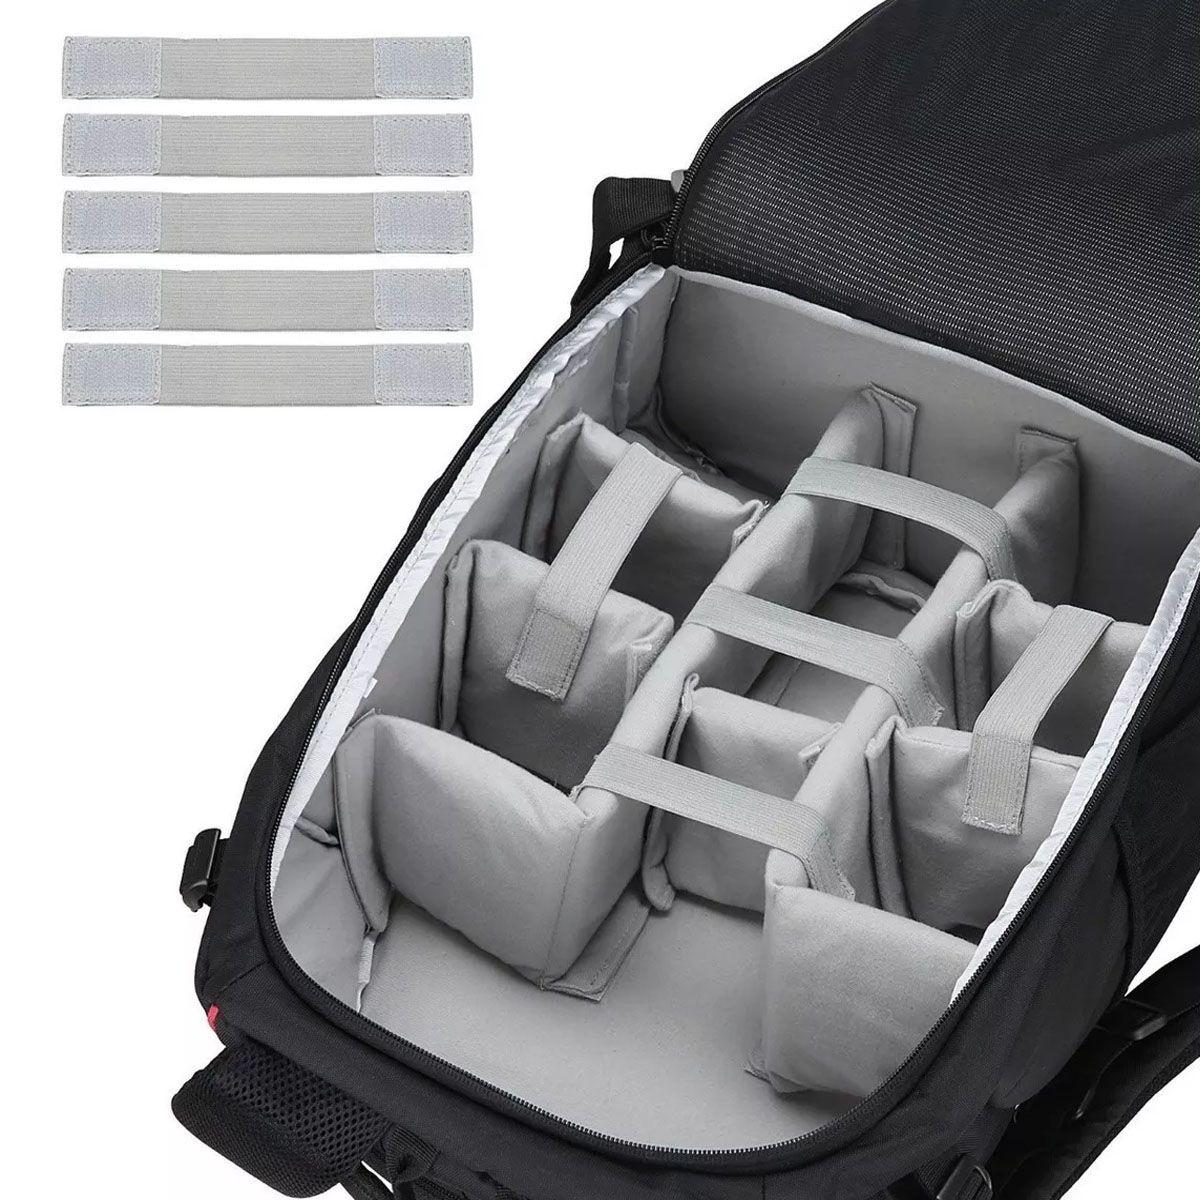 Mochila Câmera DSLR Filmadora Tablet - Ortex K7 - C35xP22xA50cm  - Diafilme Materiais Fotográficos